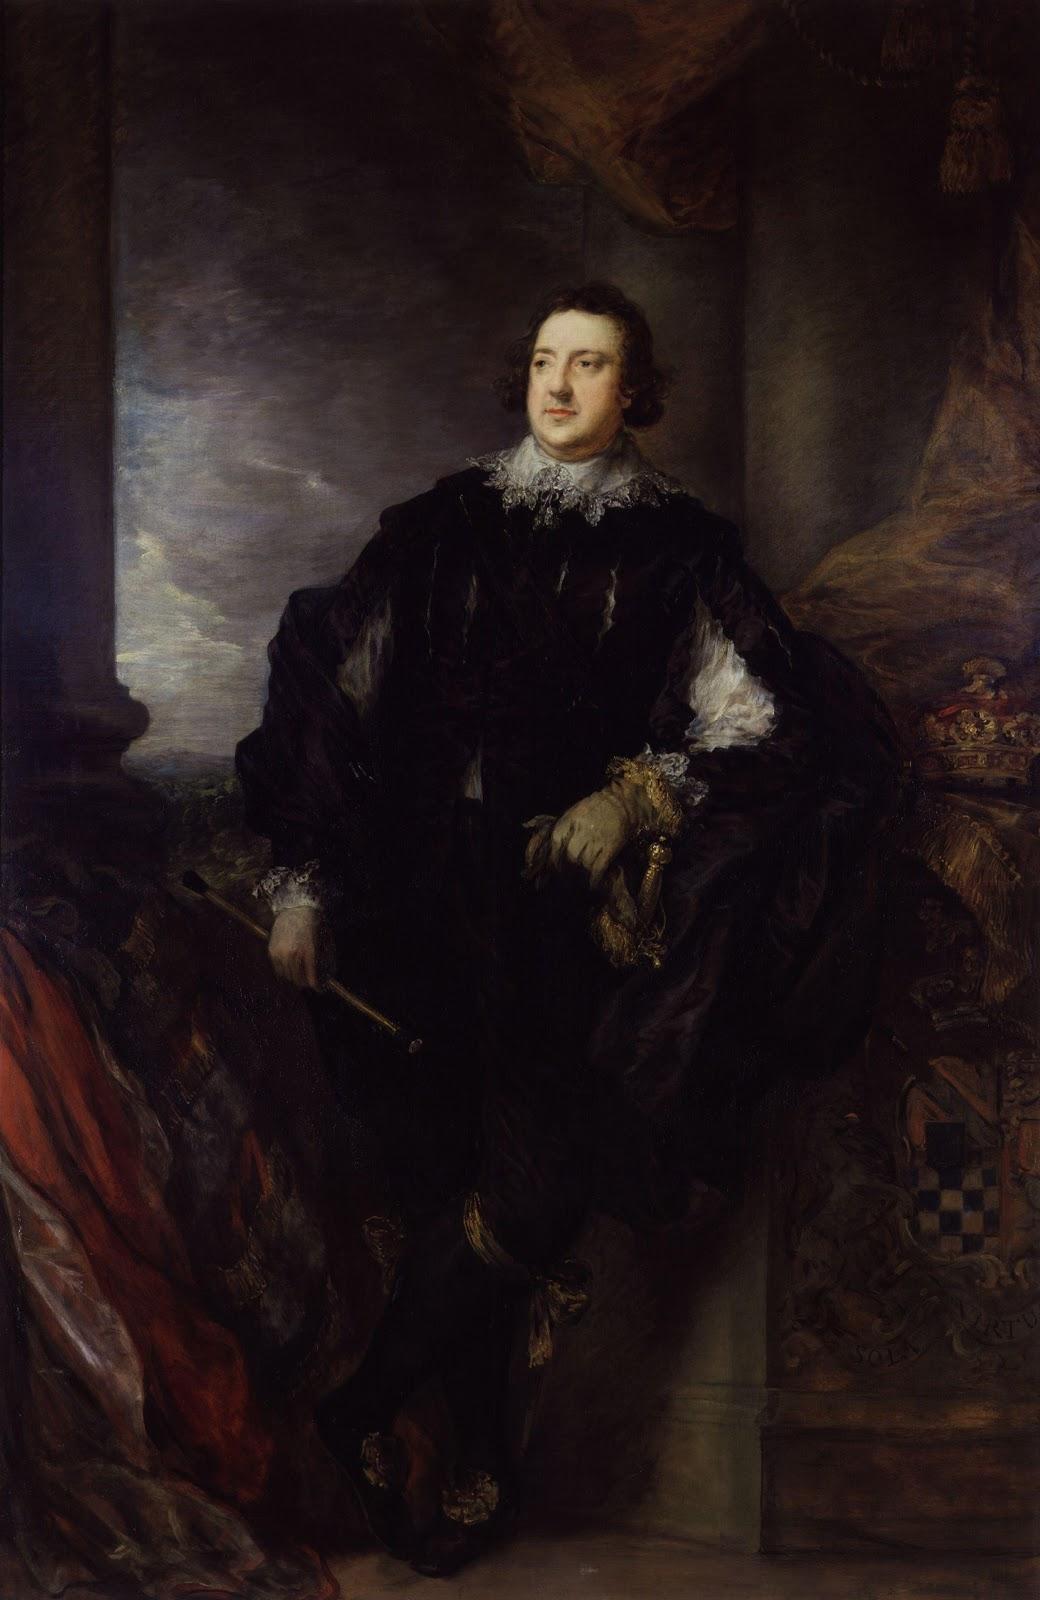 earl cathcart norfolk